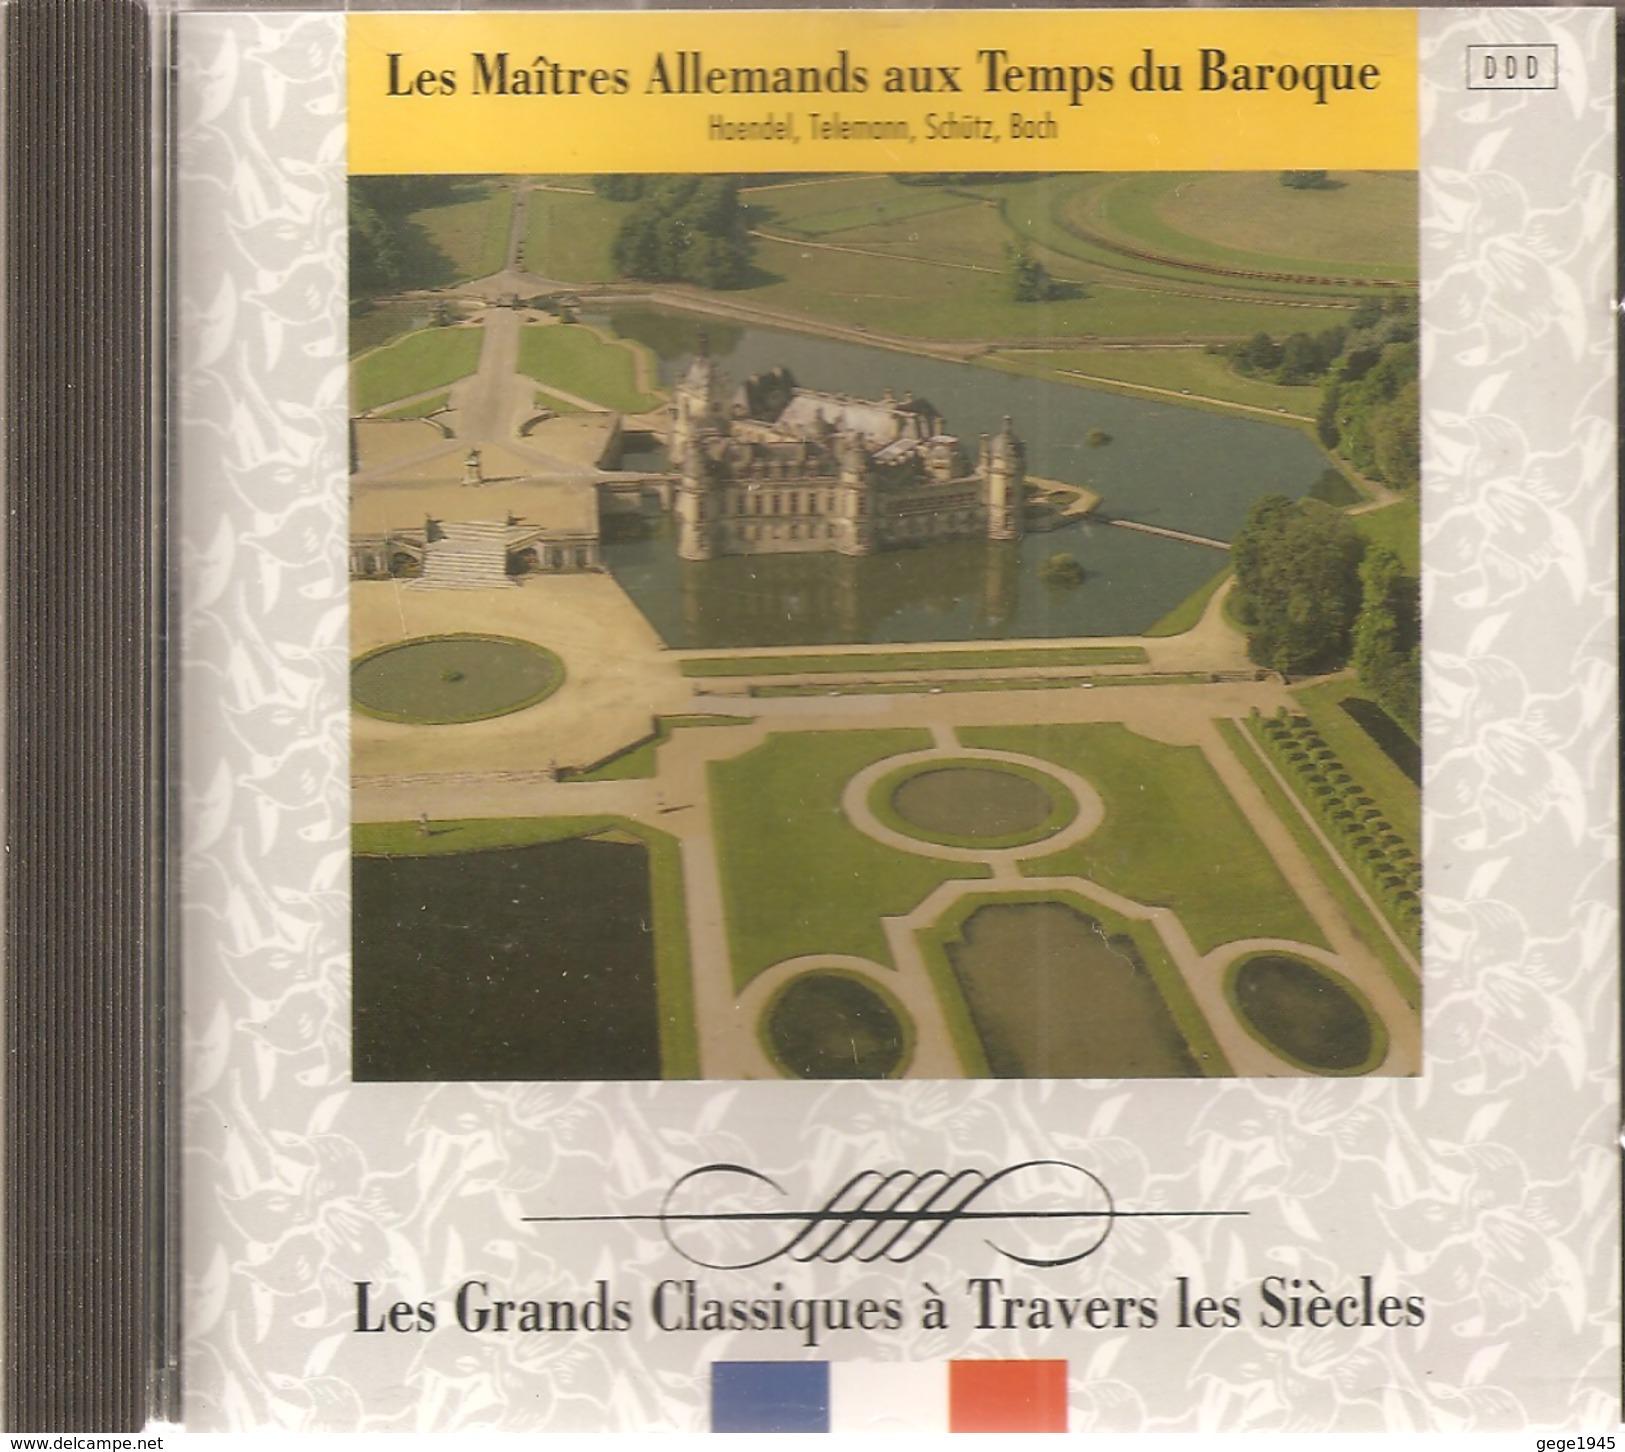 CD     Les  Maîtres  Allemands  Aux  Temps  Du  Baroque    Avec   14  Titres - Klassik